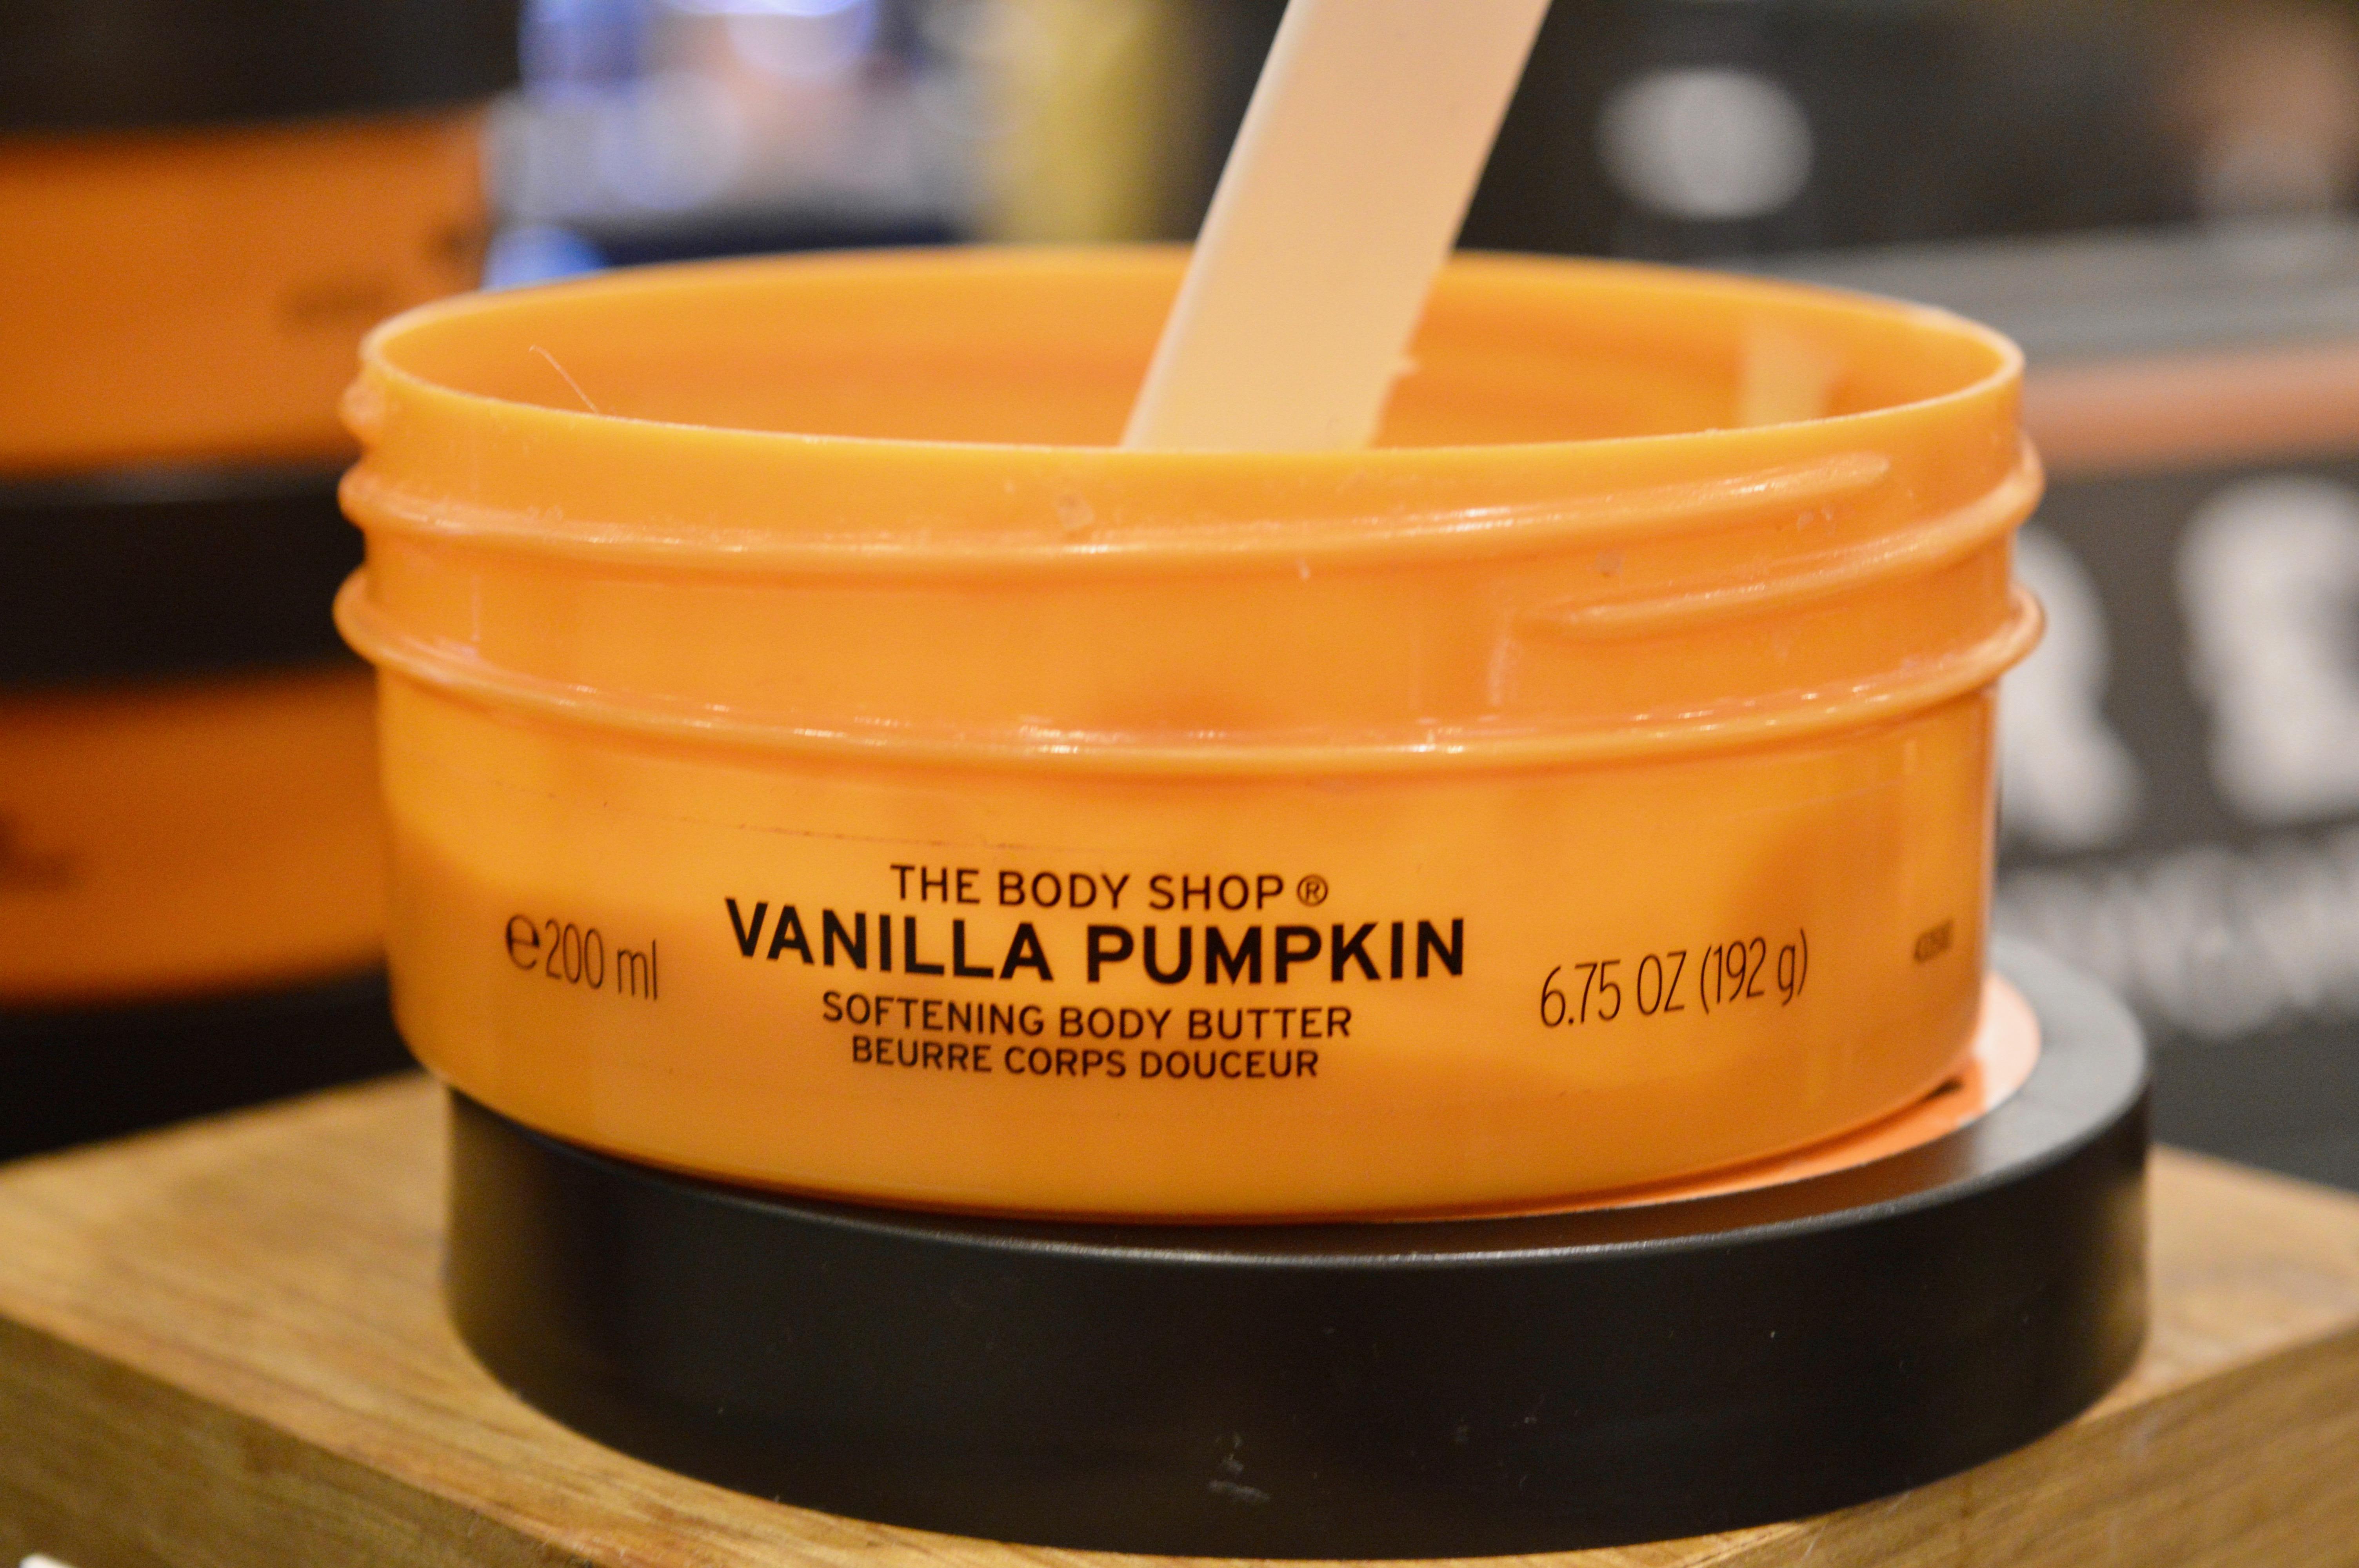 VANILLA-pumpkin-the-body-shop-gianni-edit-intu-metrocentre-gateshead-elle-blonde-luxury-lifestyle-destination-blog